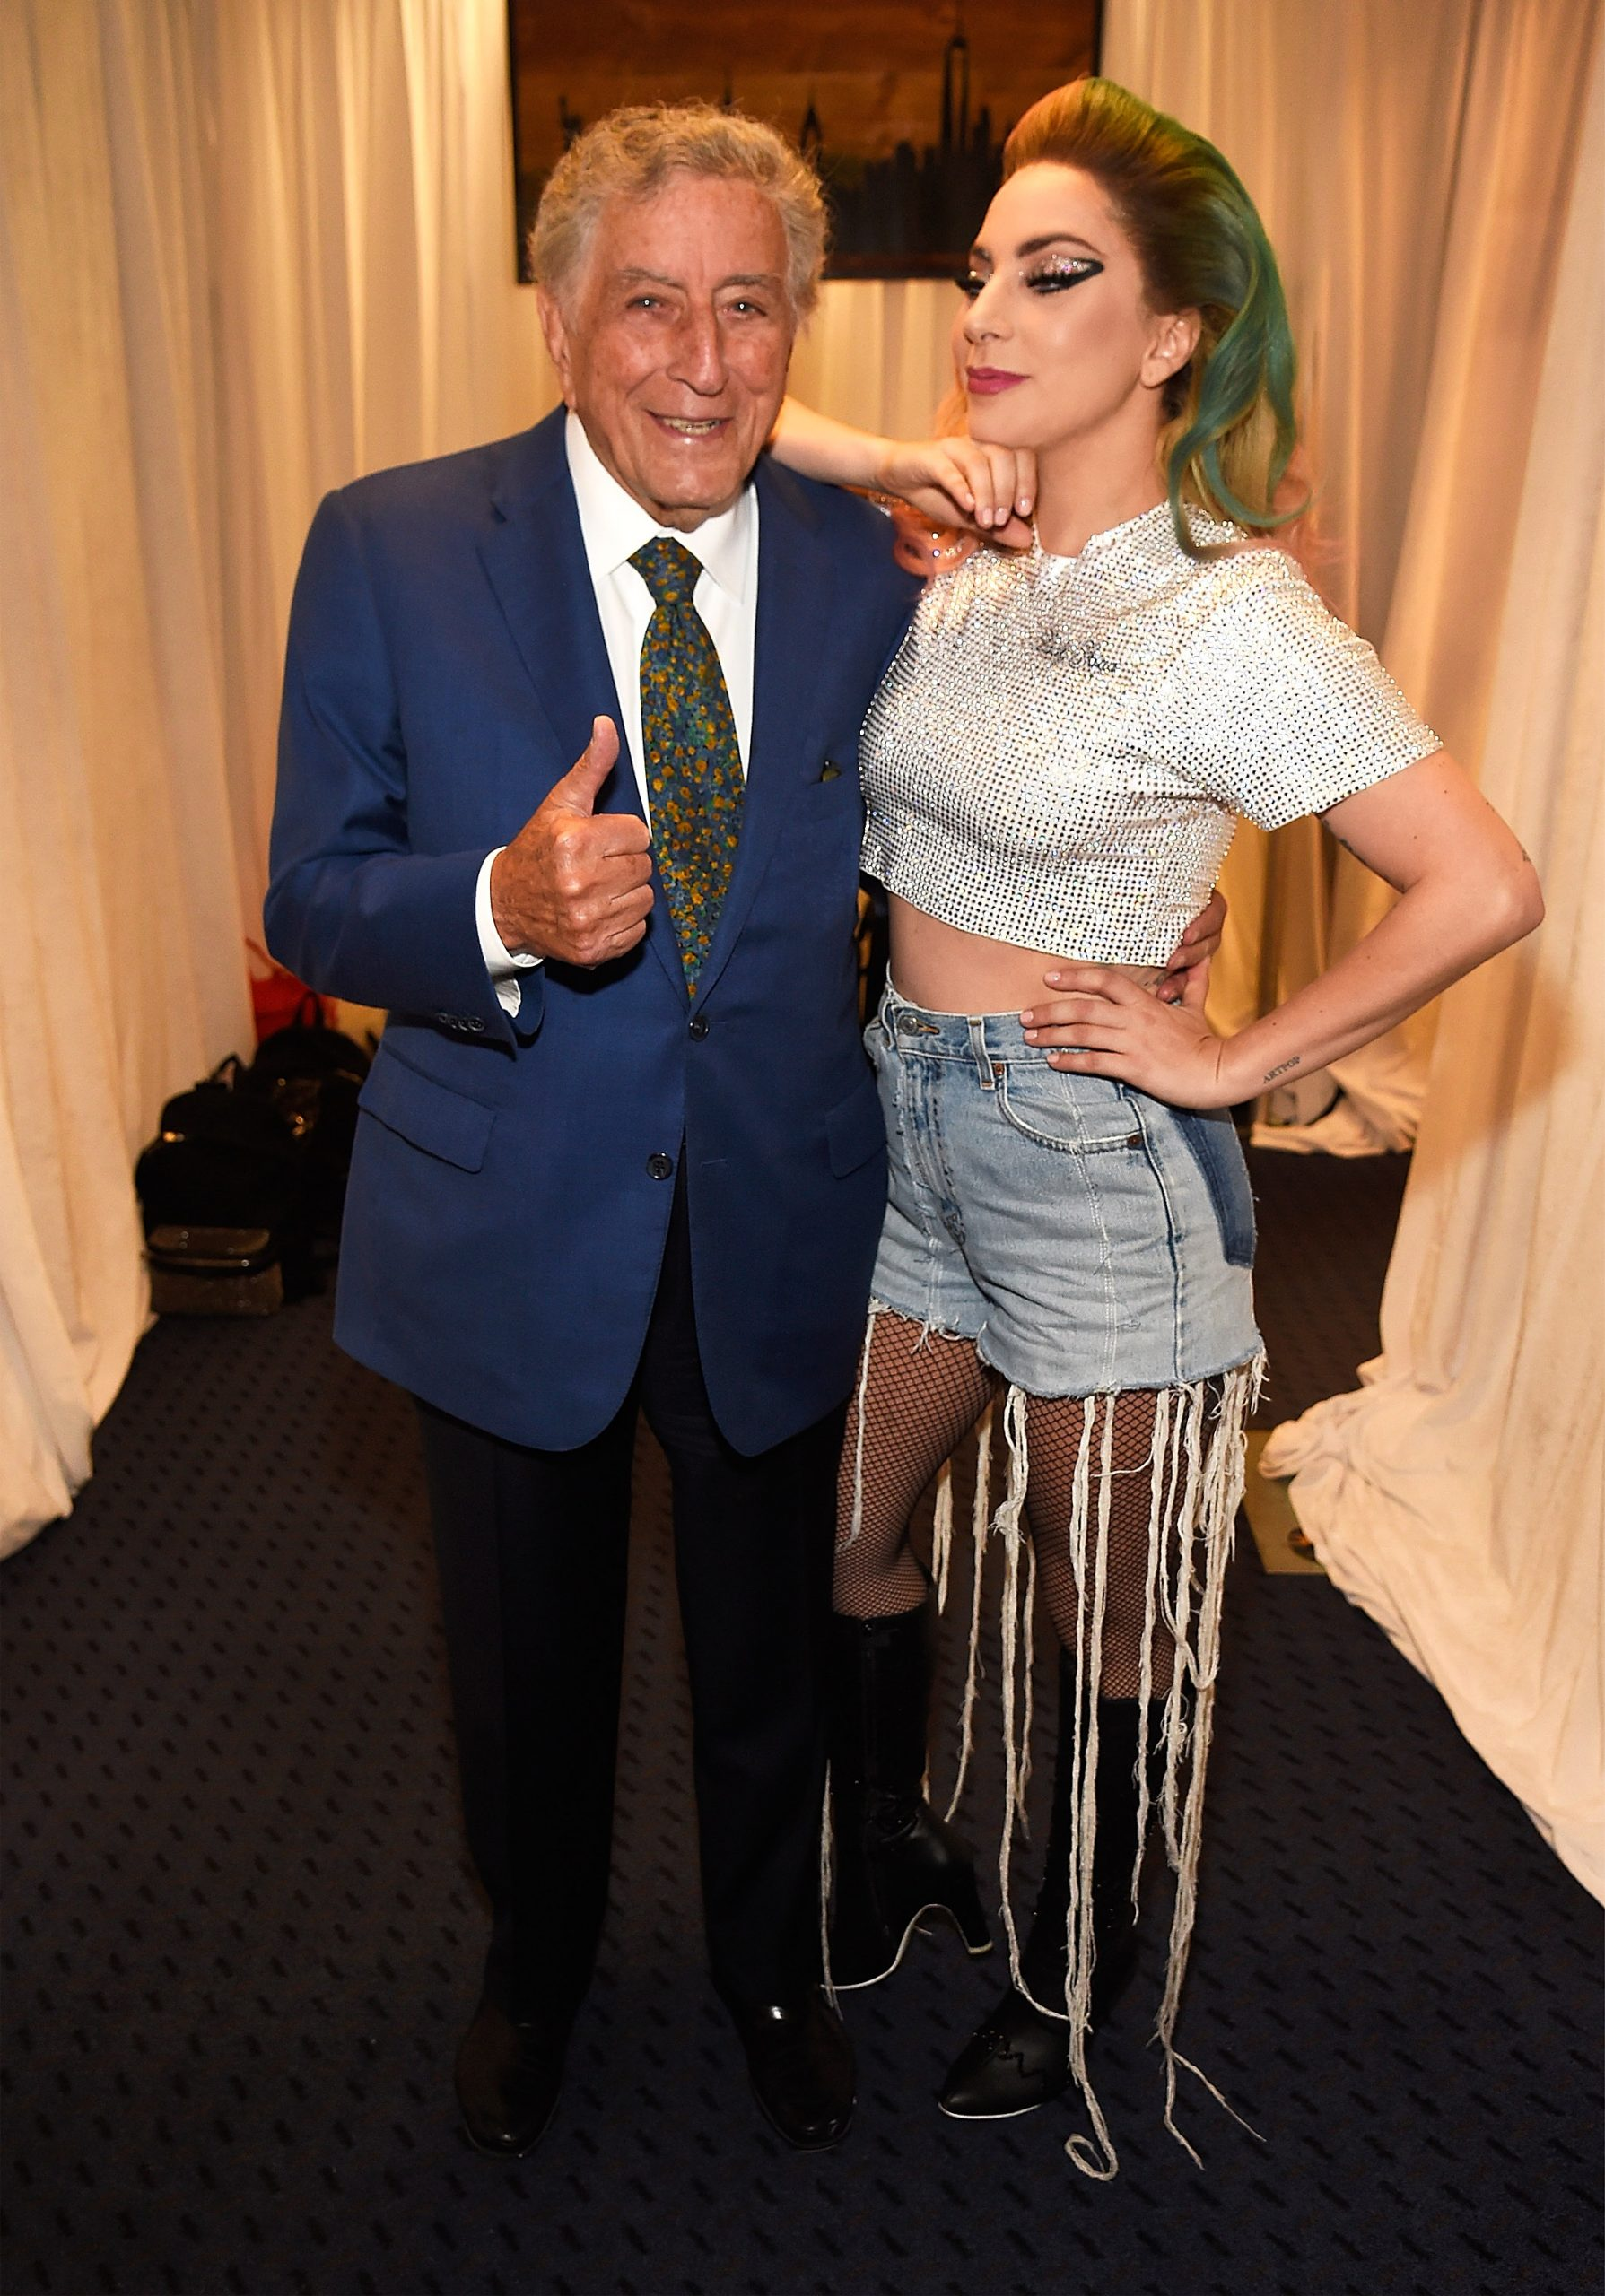 el evento que reunirá a Lady Gaga y a Tony Bennett